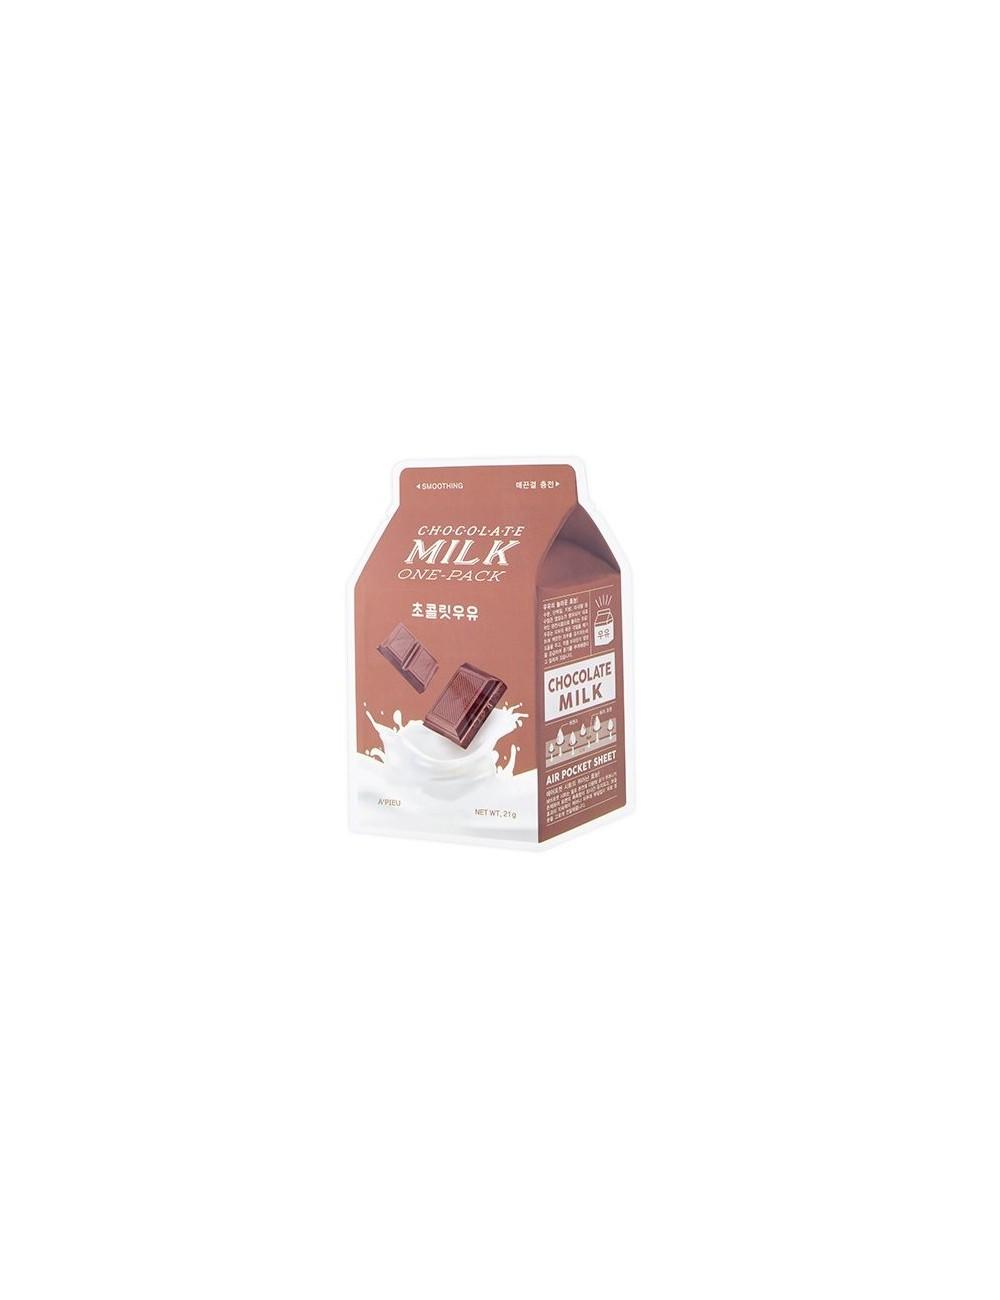 Mascarilla Purificante A'pieu Chocolate Milk Sheet Mask